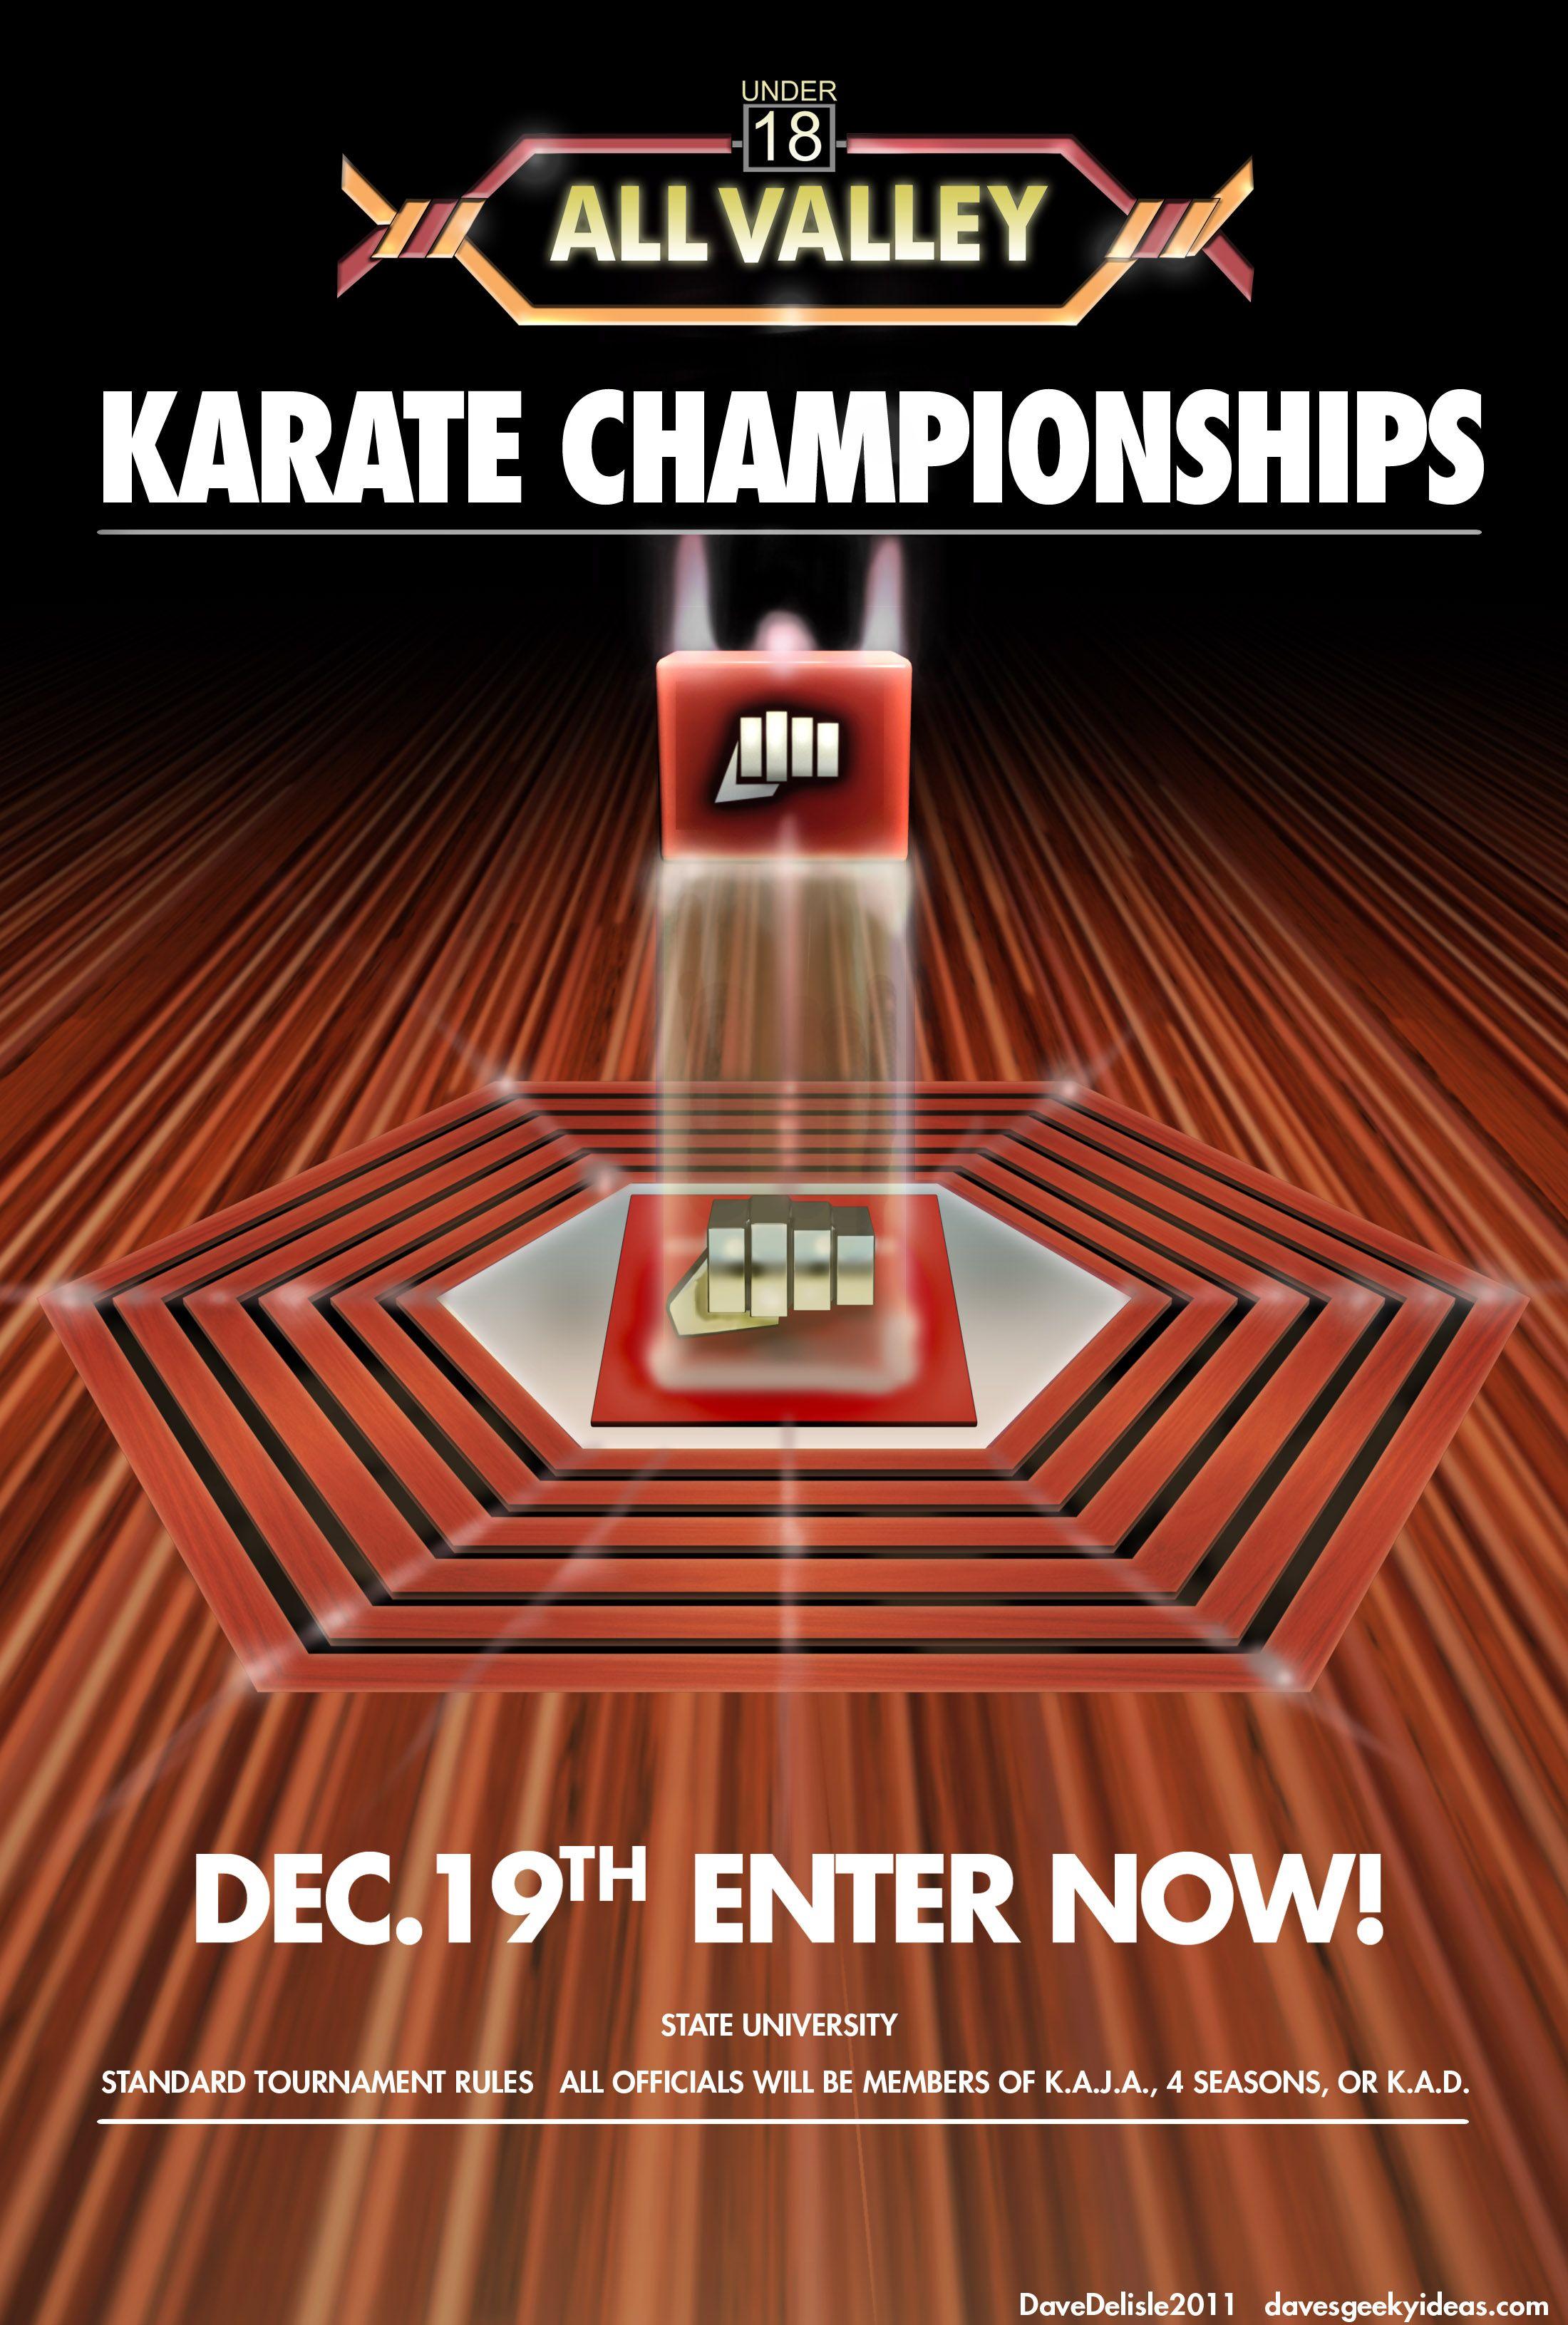 Karate-Kid-Tournament-Poster-All-Valley-Large-1984-2011 ... Karate Kid 1984 Poster